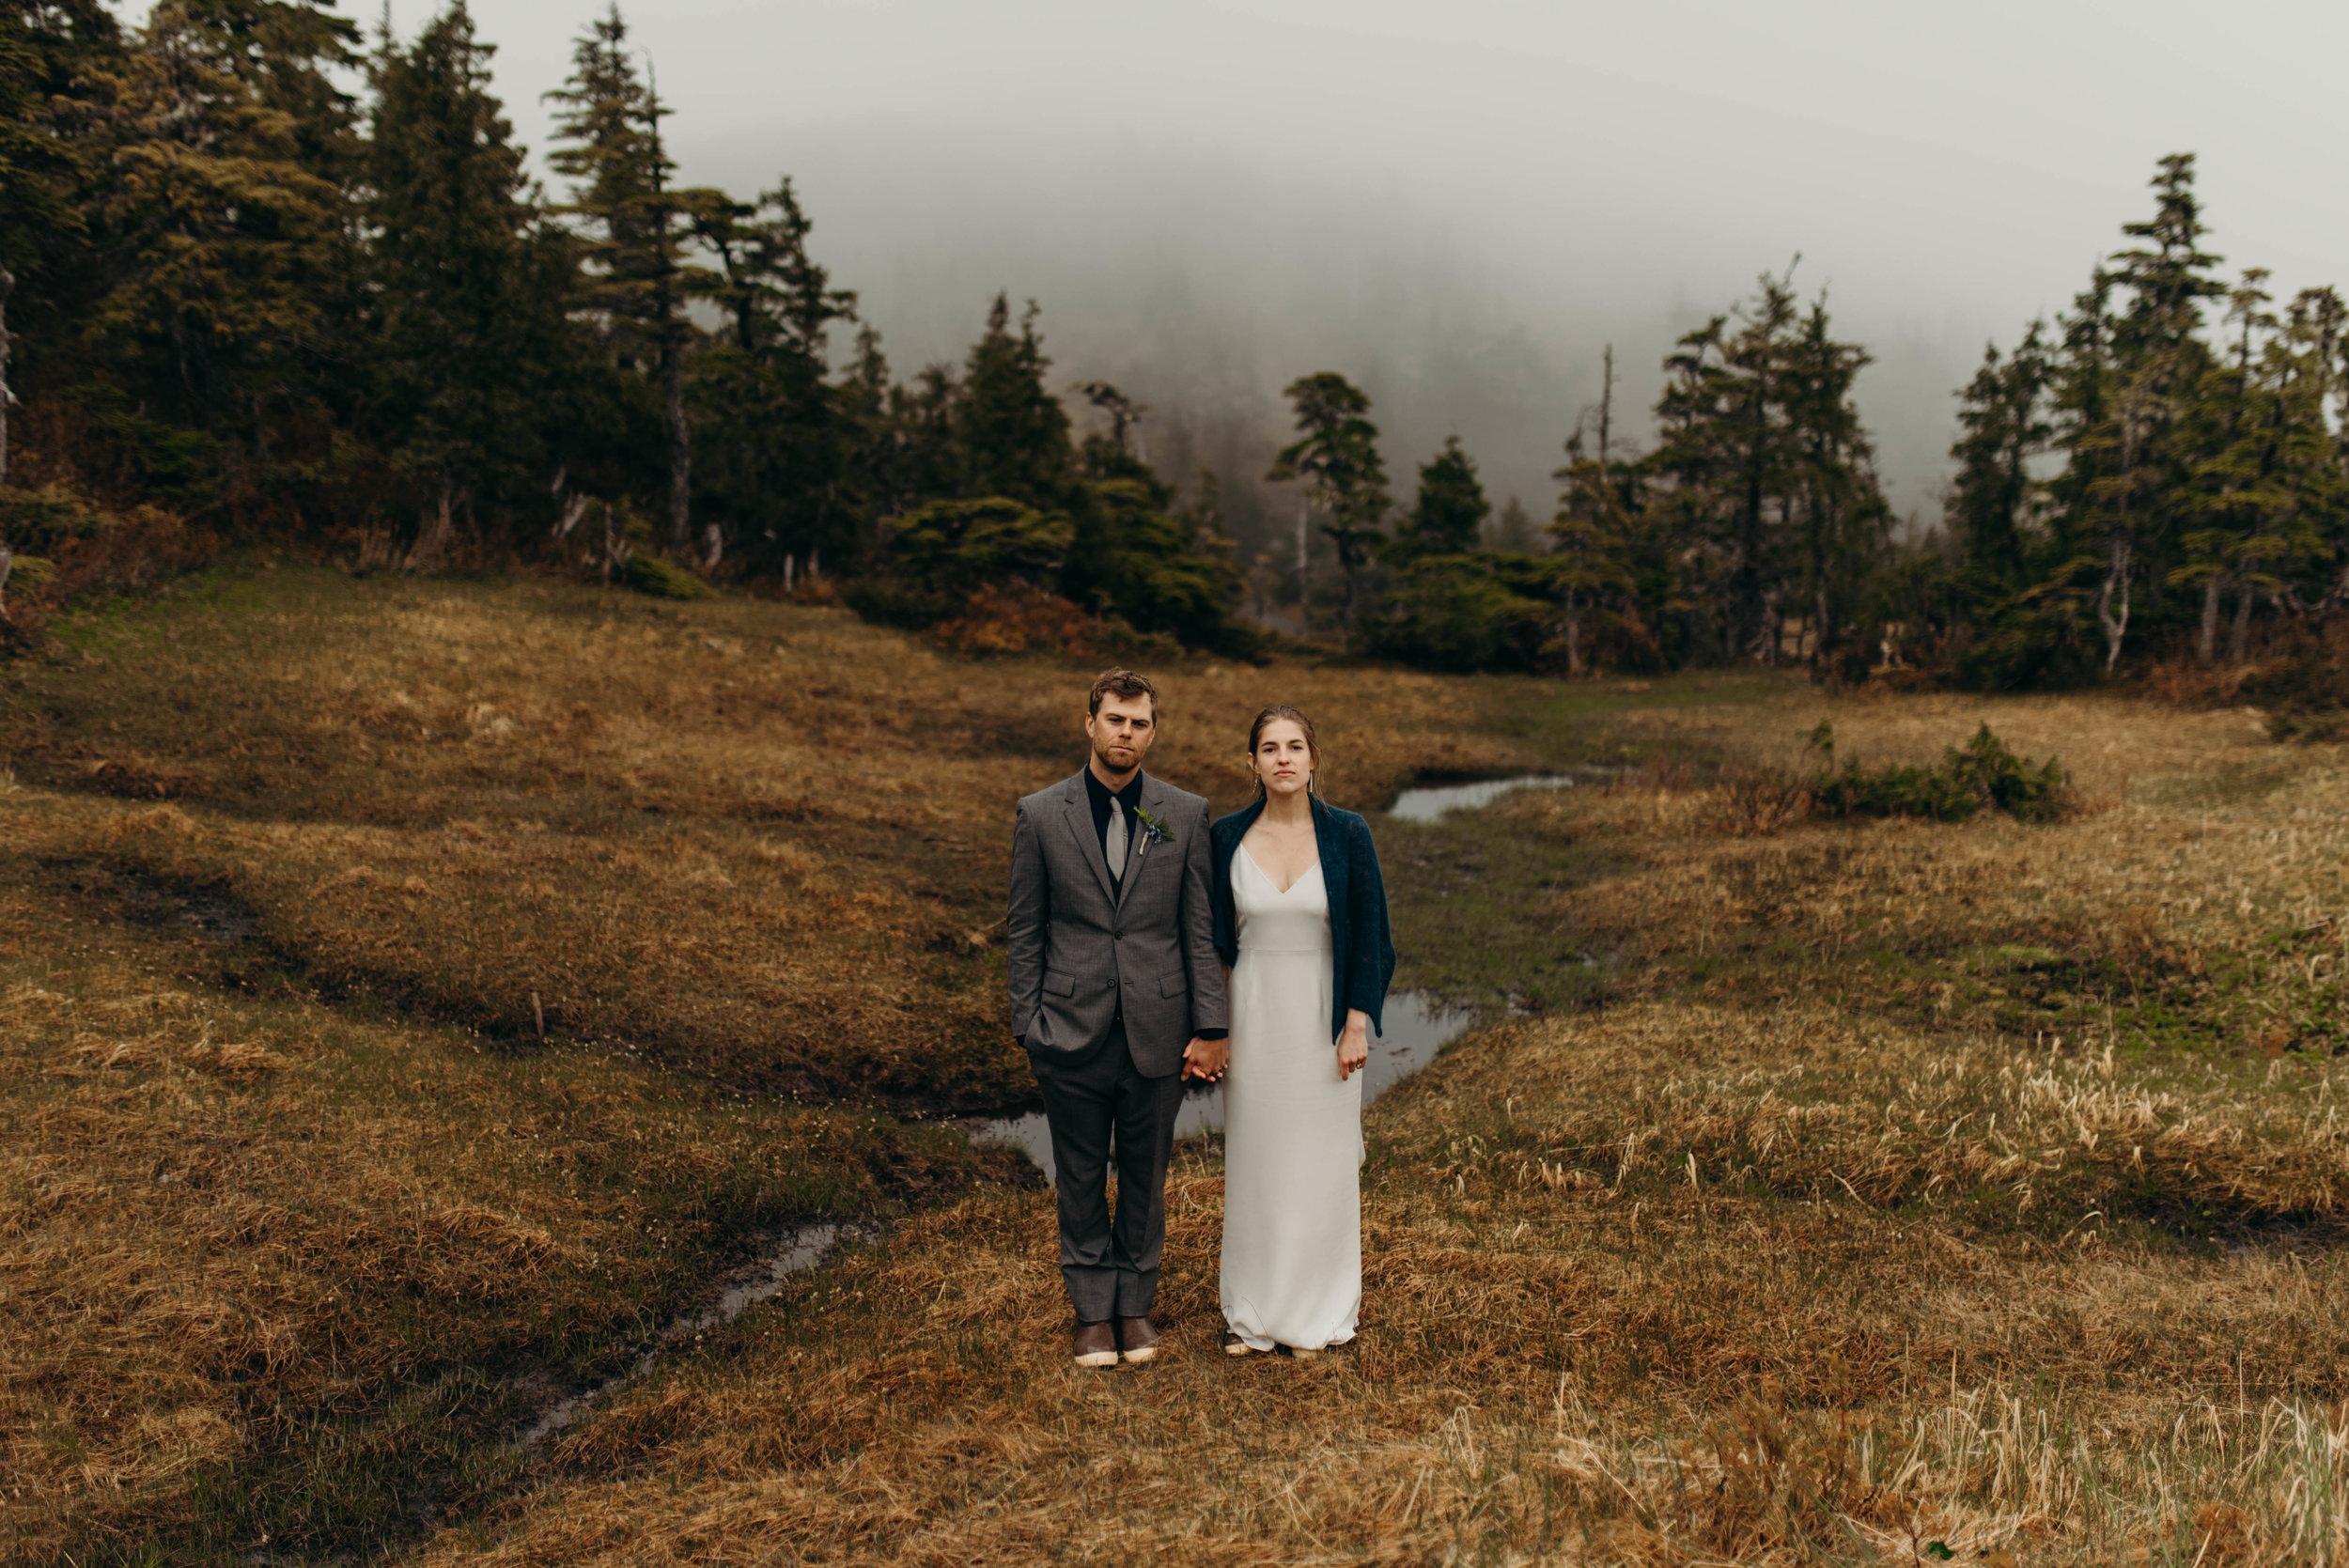 Bride & groom in muskeg, Sitka, Alaska diy mountain wedding